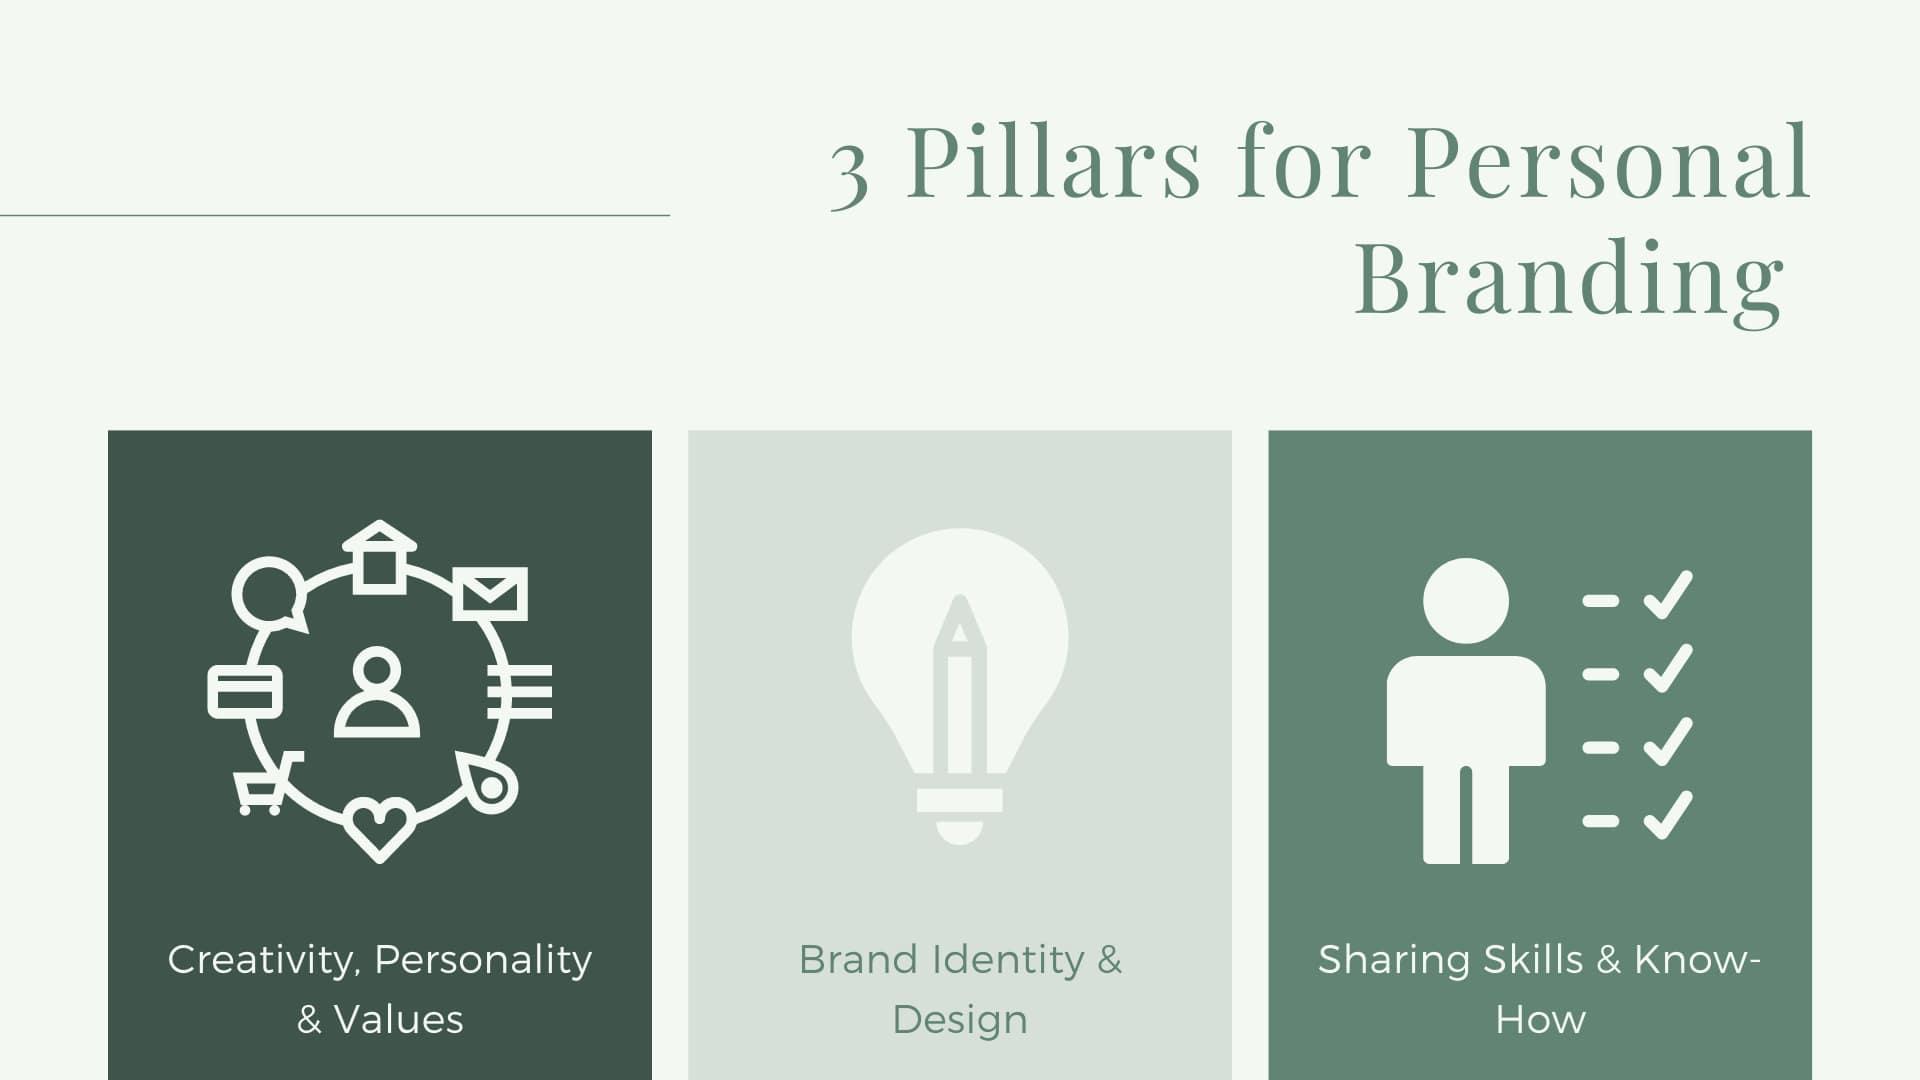 the 3 pillars of personal branding